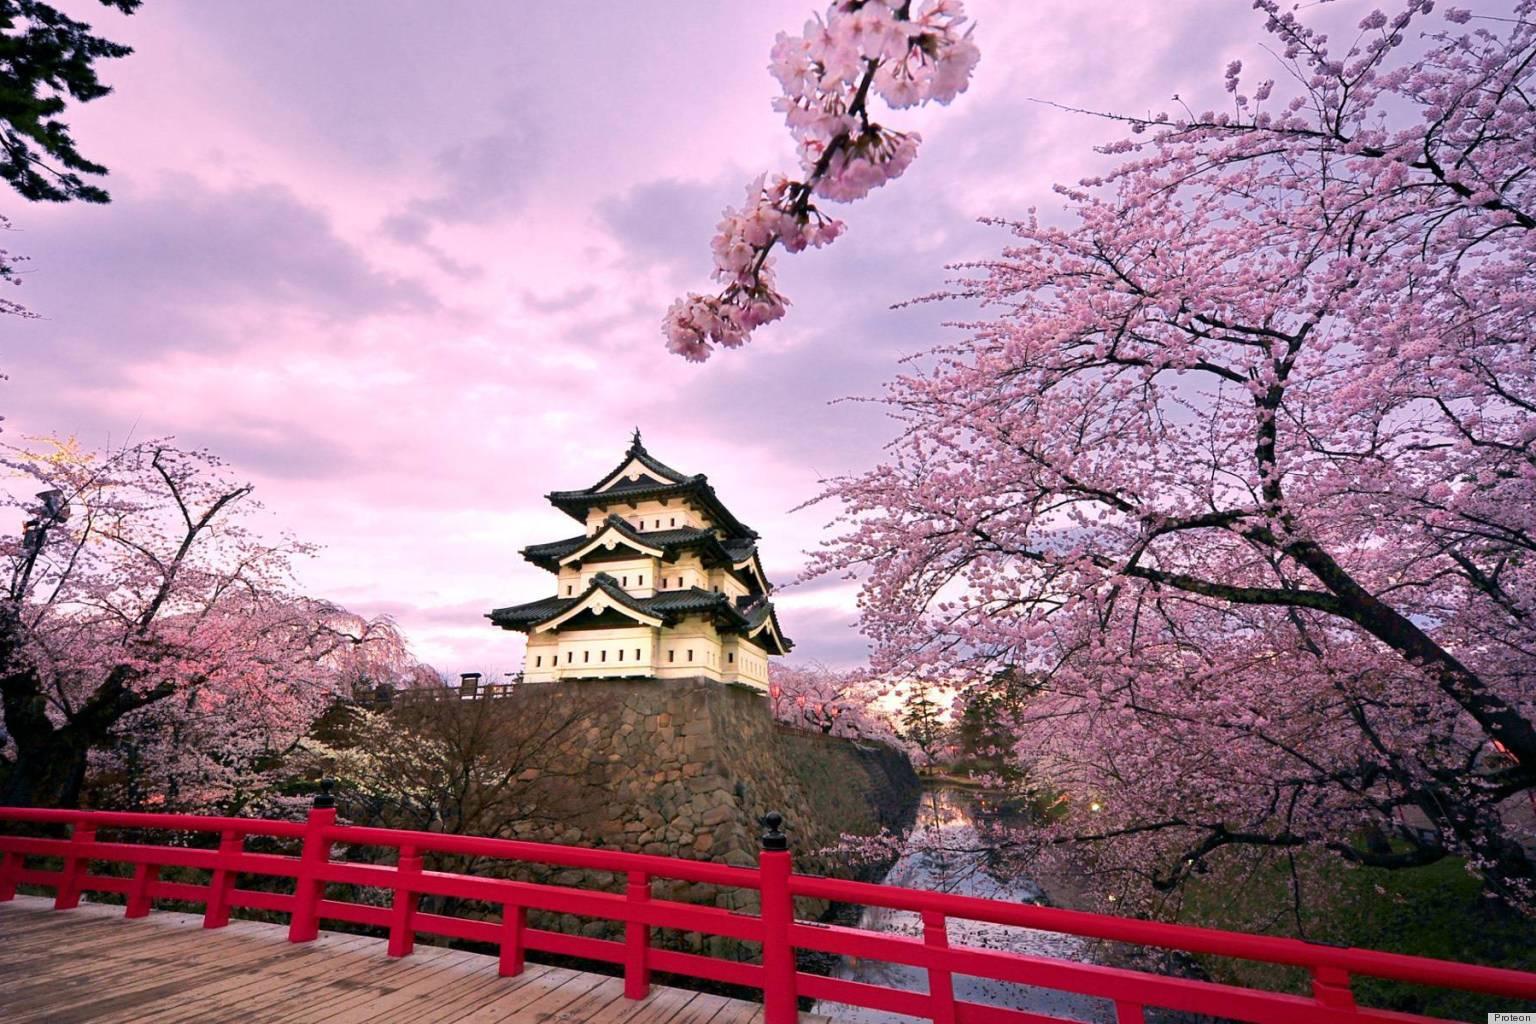 Japanese Cherry Blossom Trees Bursting Into Bloom Make Us ...